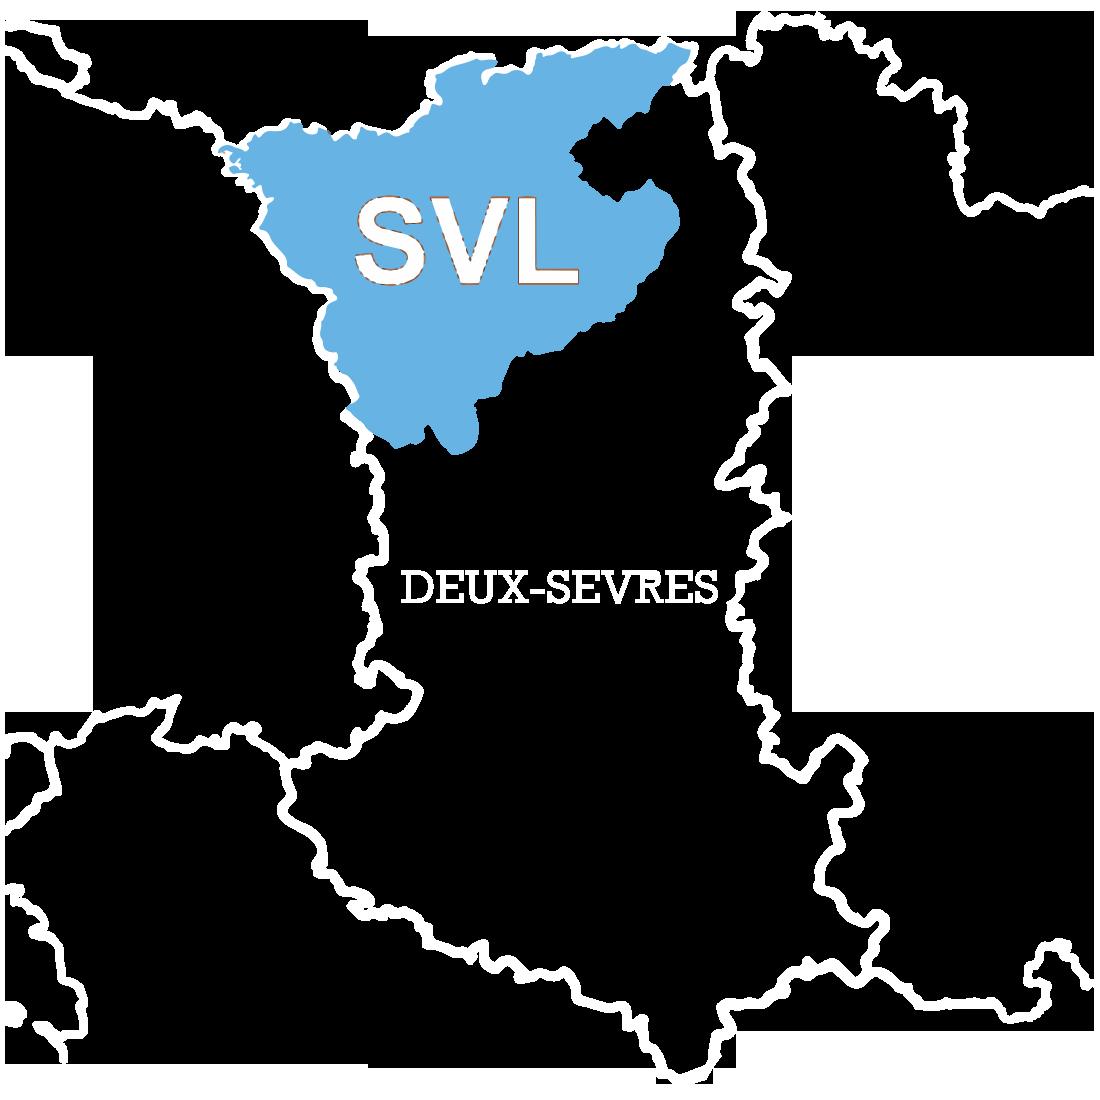 Le territoire du SVL